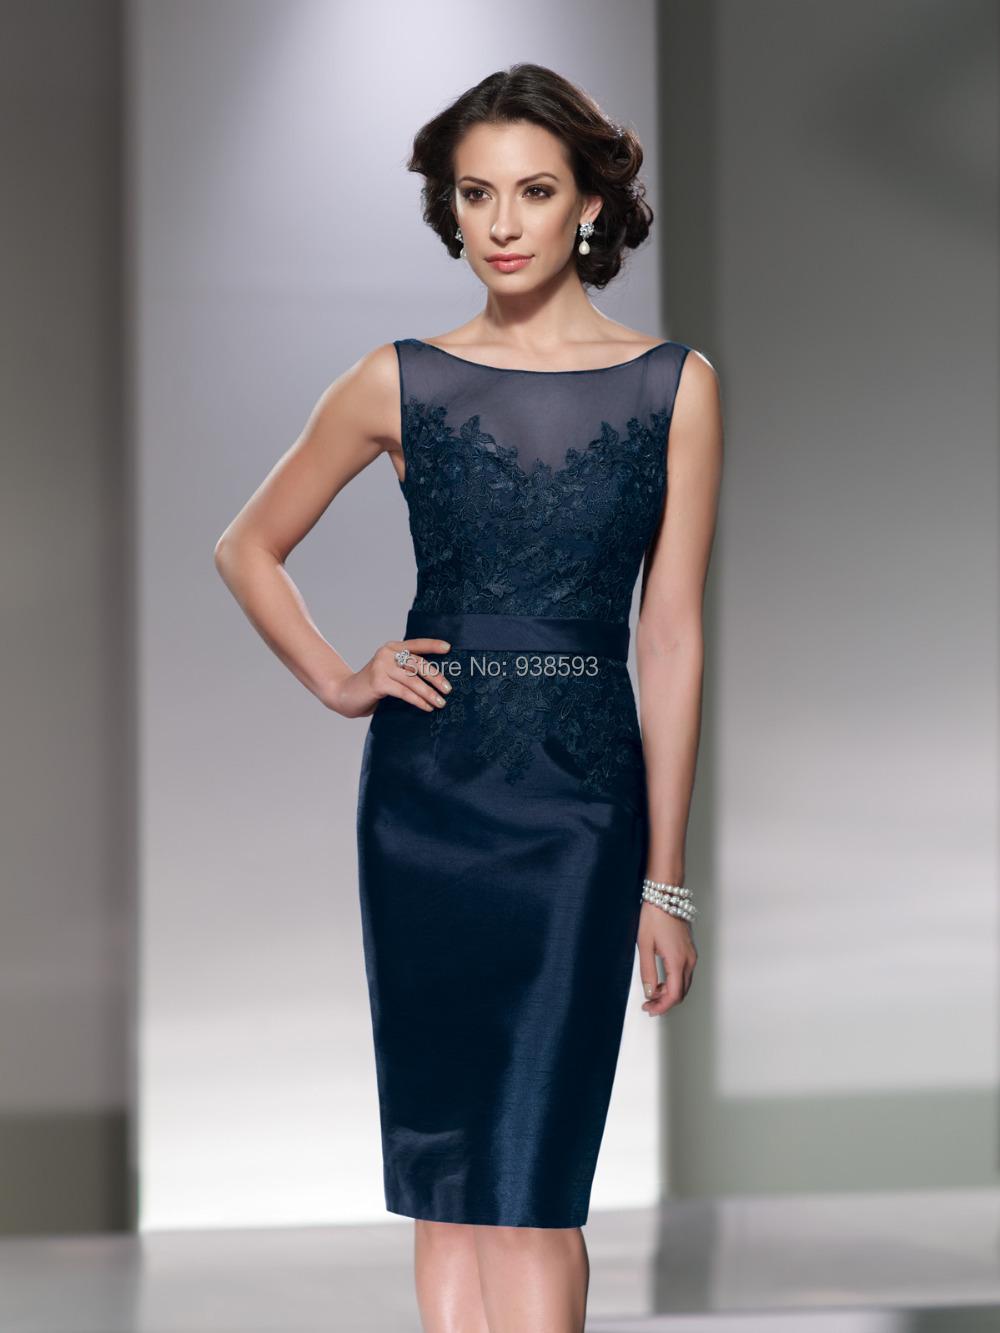 navy blue winter bridesmaid dresses navy dresses for weddings 36 Best Bridesmaid Dresses For Winter Fashion Craze